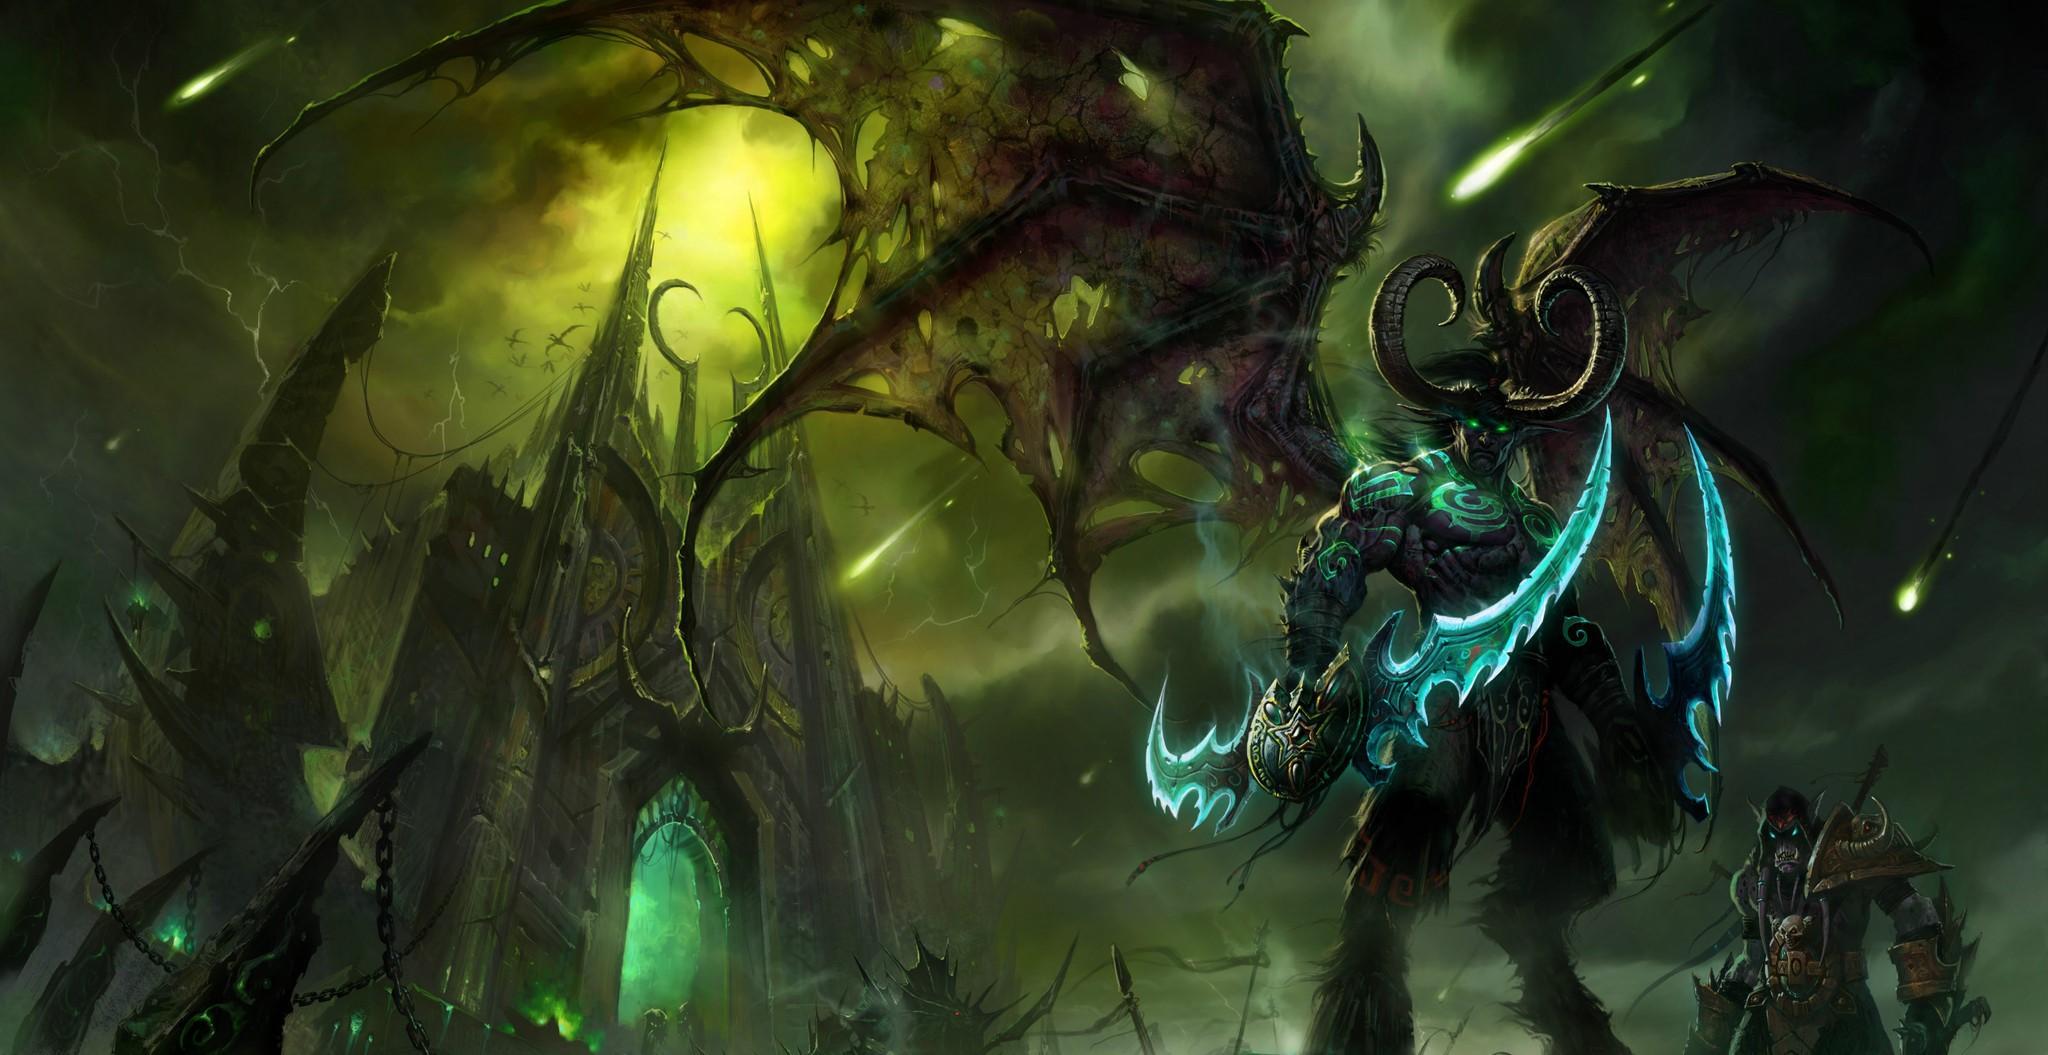 World of Warcraft HQ